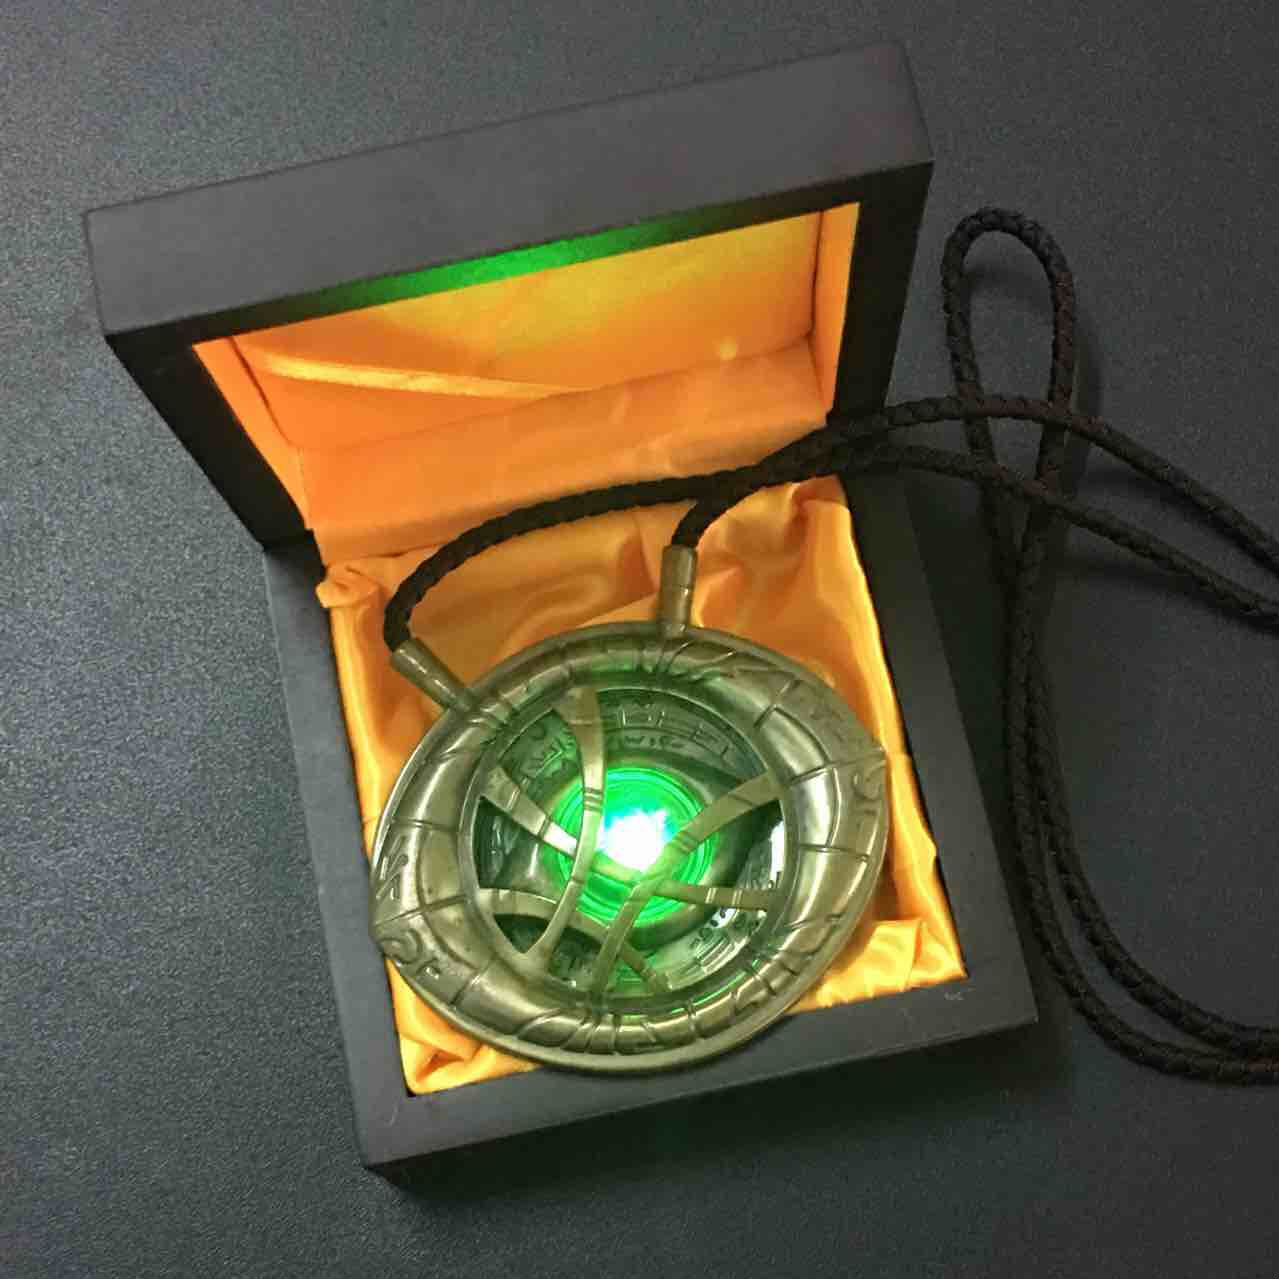 Marvel Avengers Doctor Strange Infinity Time Stones Necklace Keychain Figure